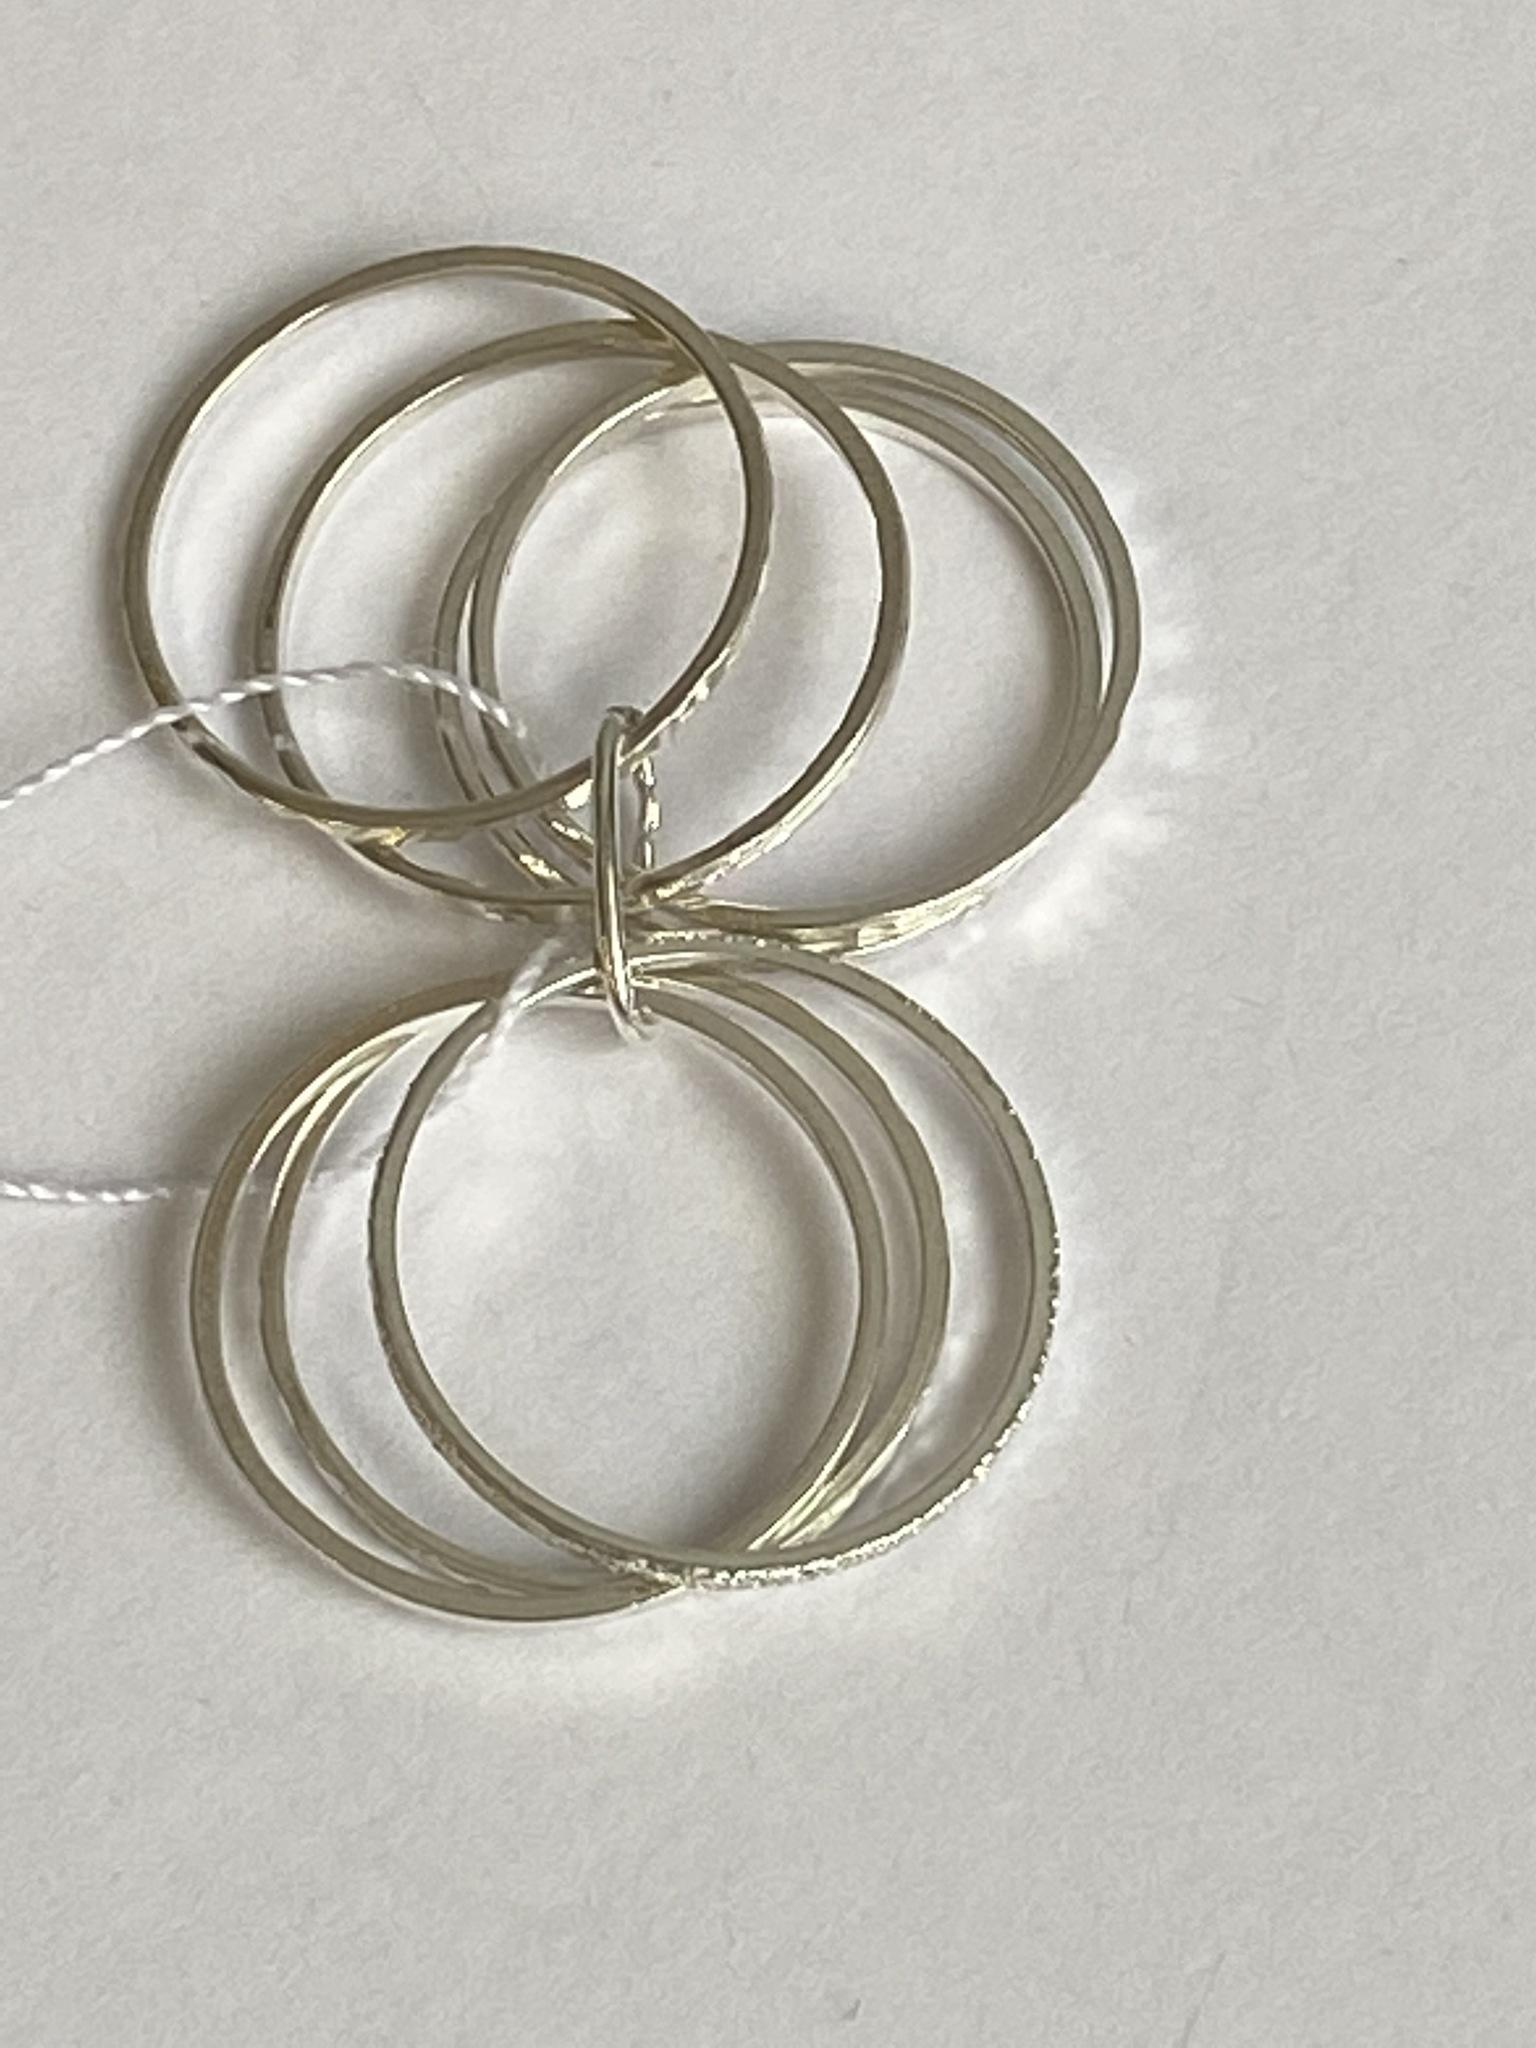 Неделька (кольцо из серебра)